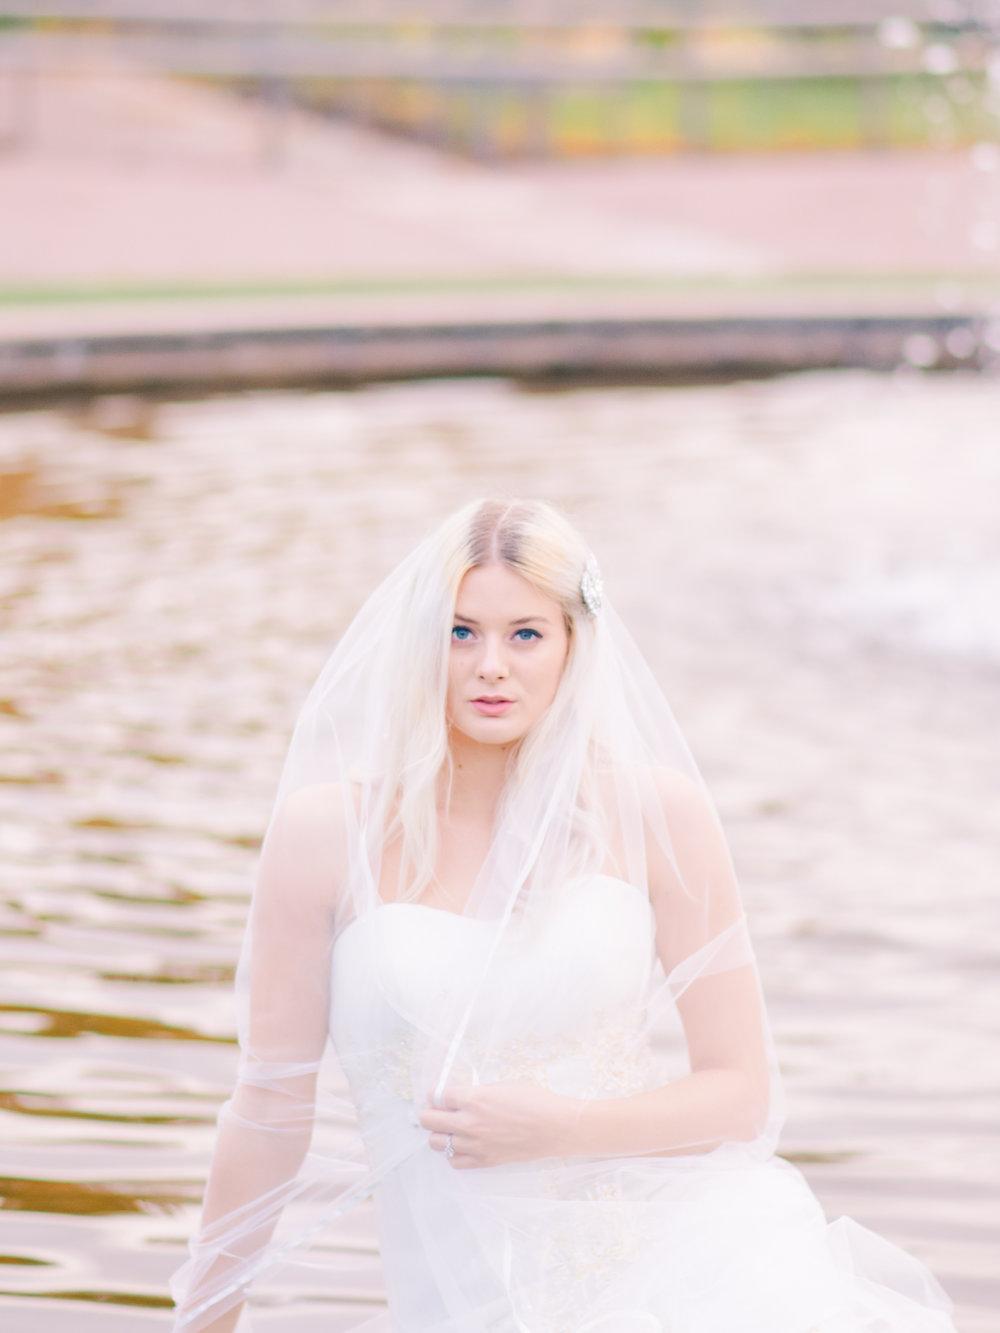 Elegant Organic Fall Swedish Bridal Wedding Styled Shoot - Erika Alvarenga Photography-36.jpg